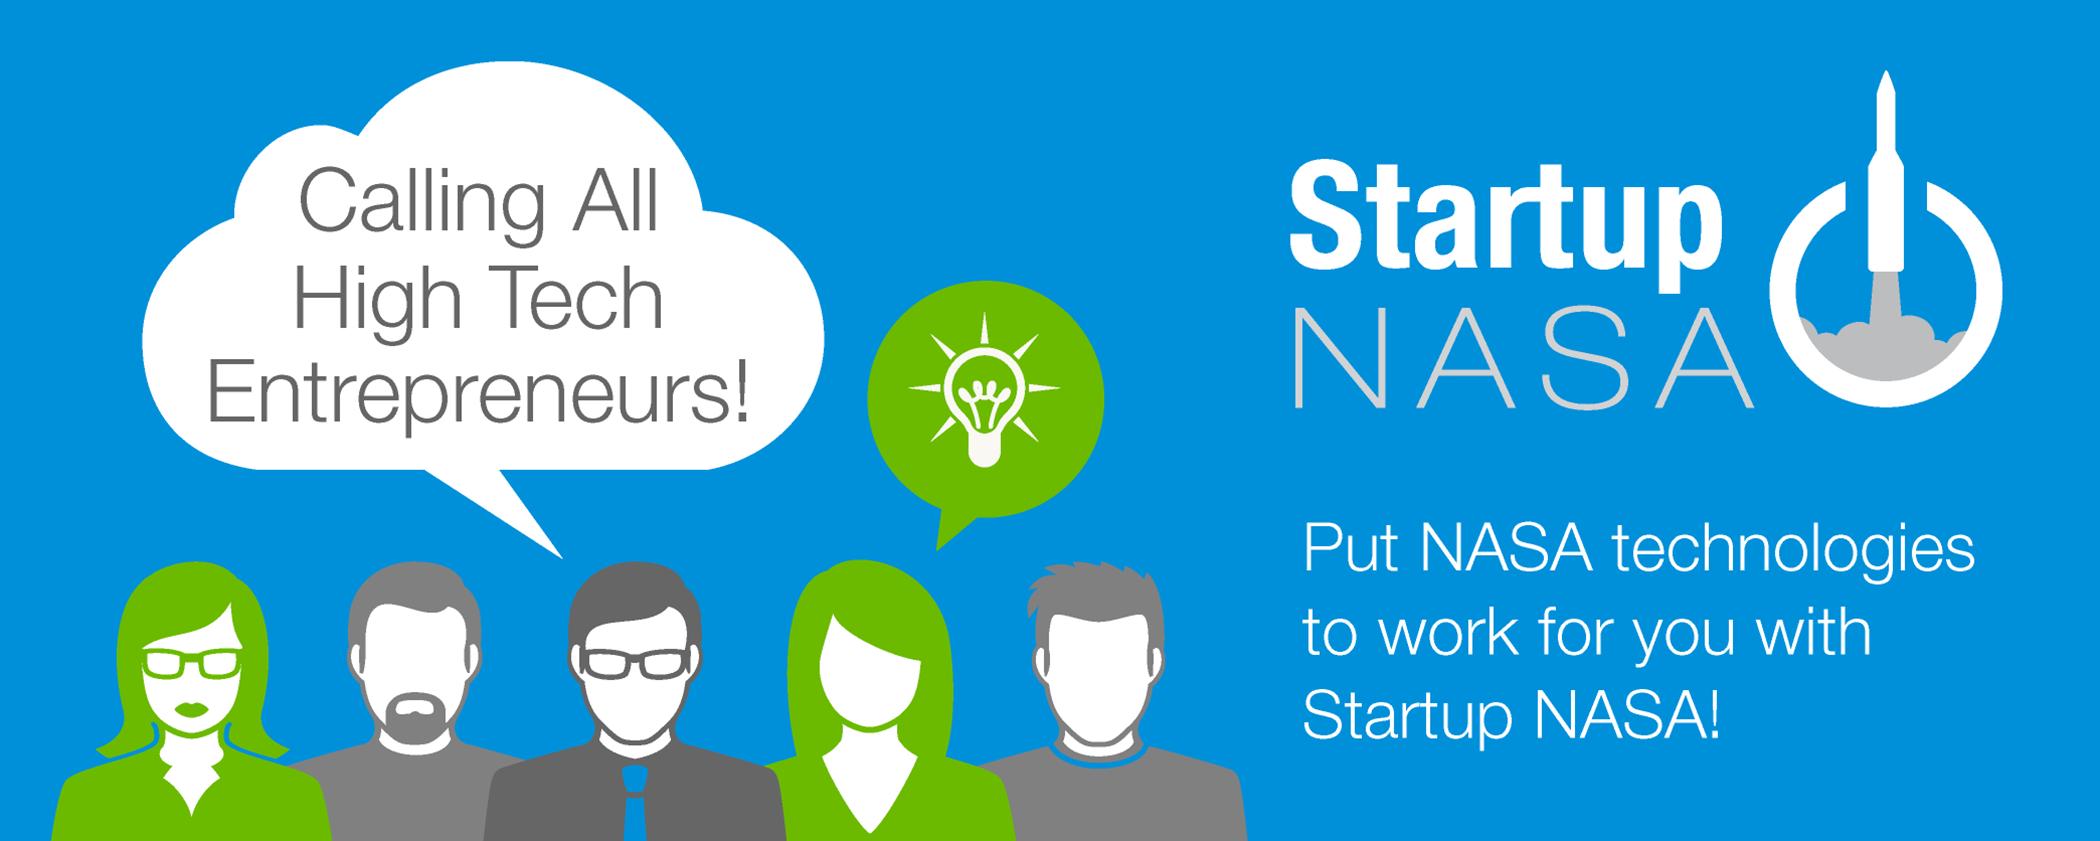 Startup NASA Banner